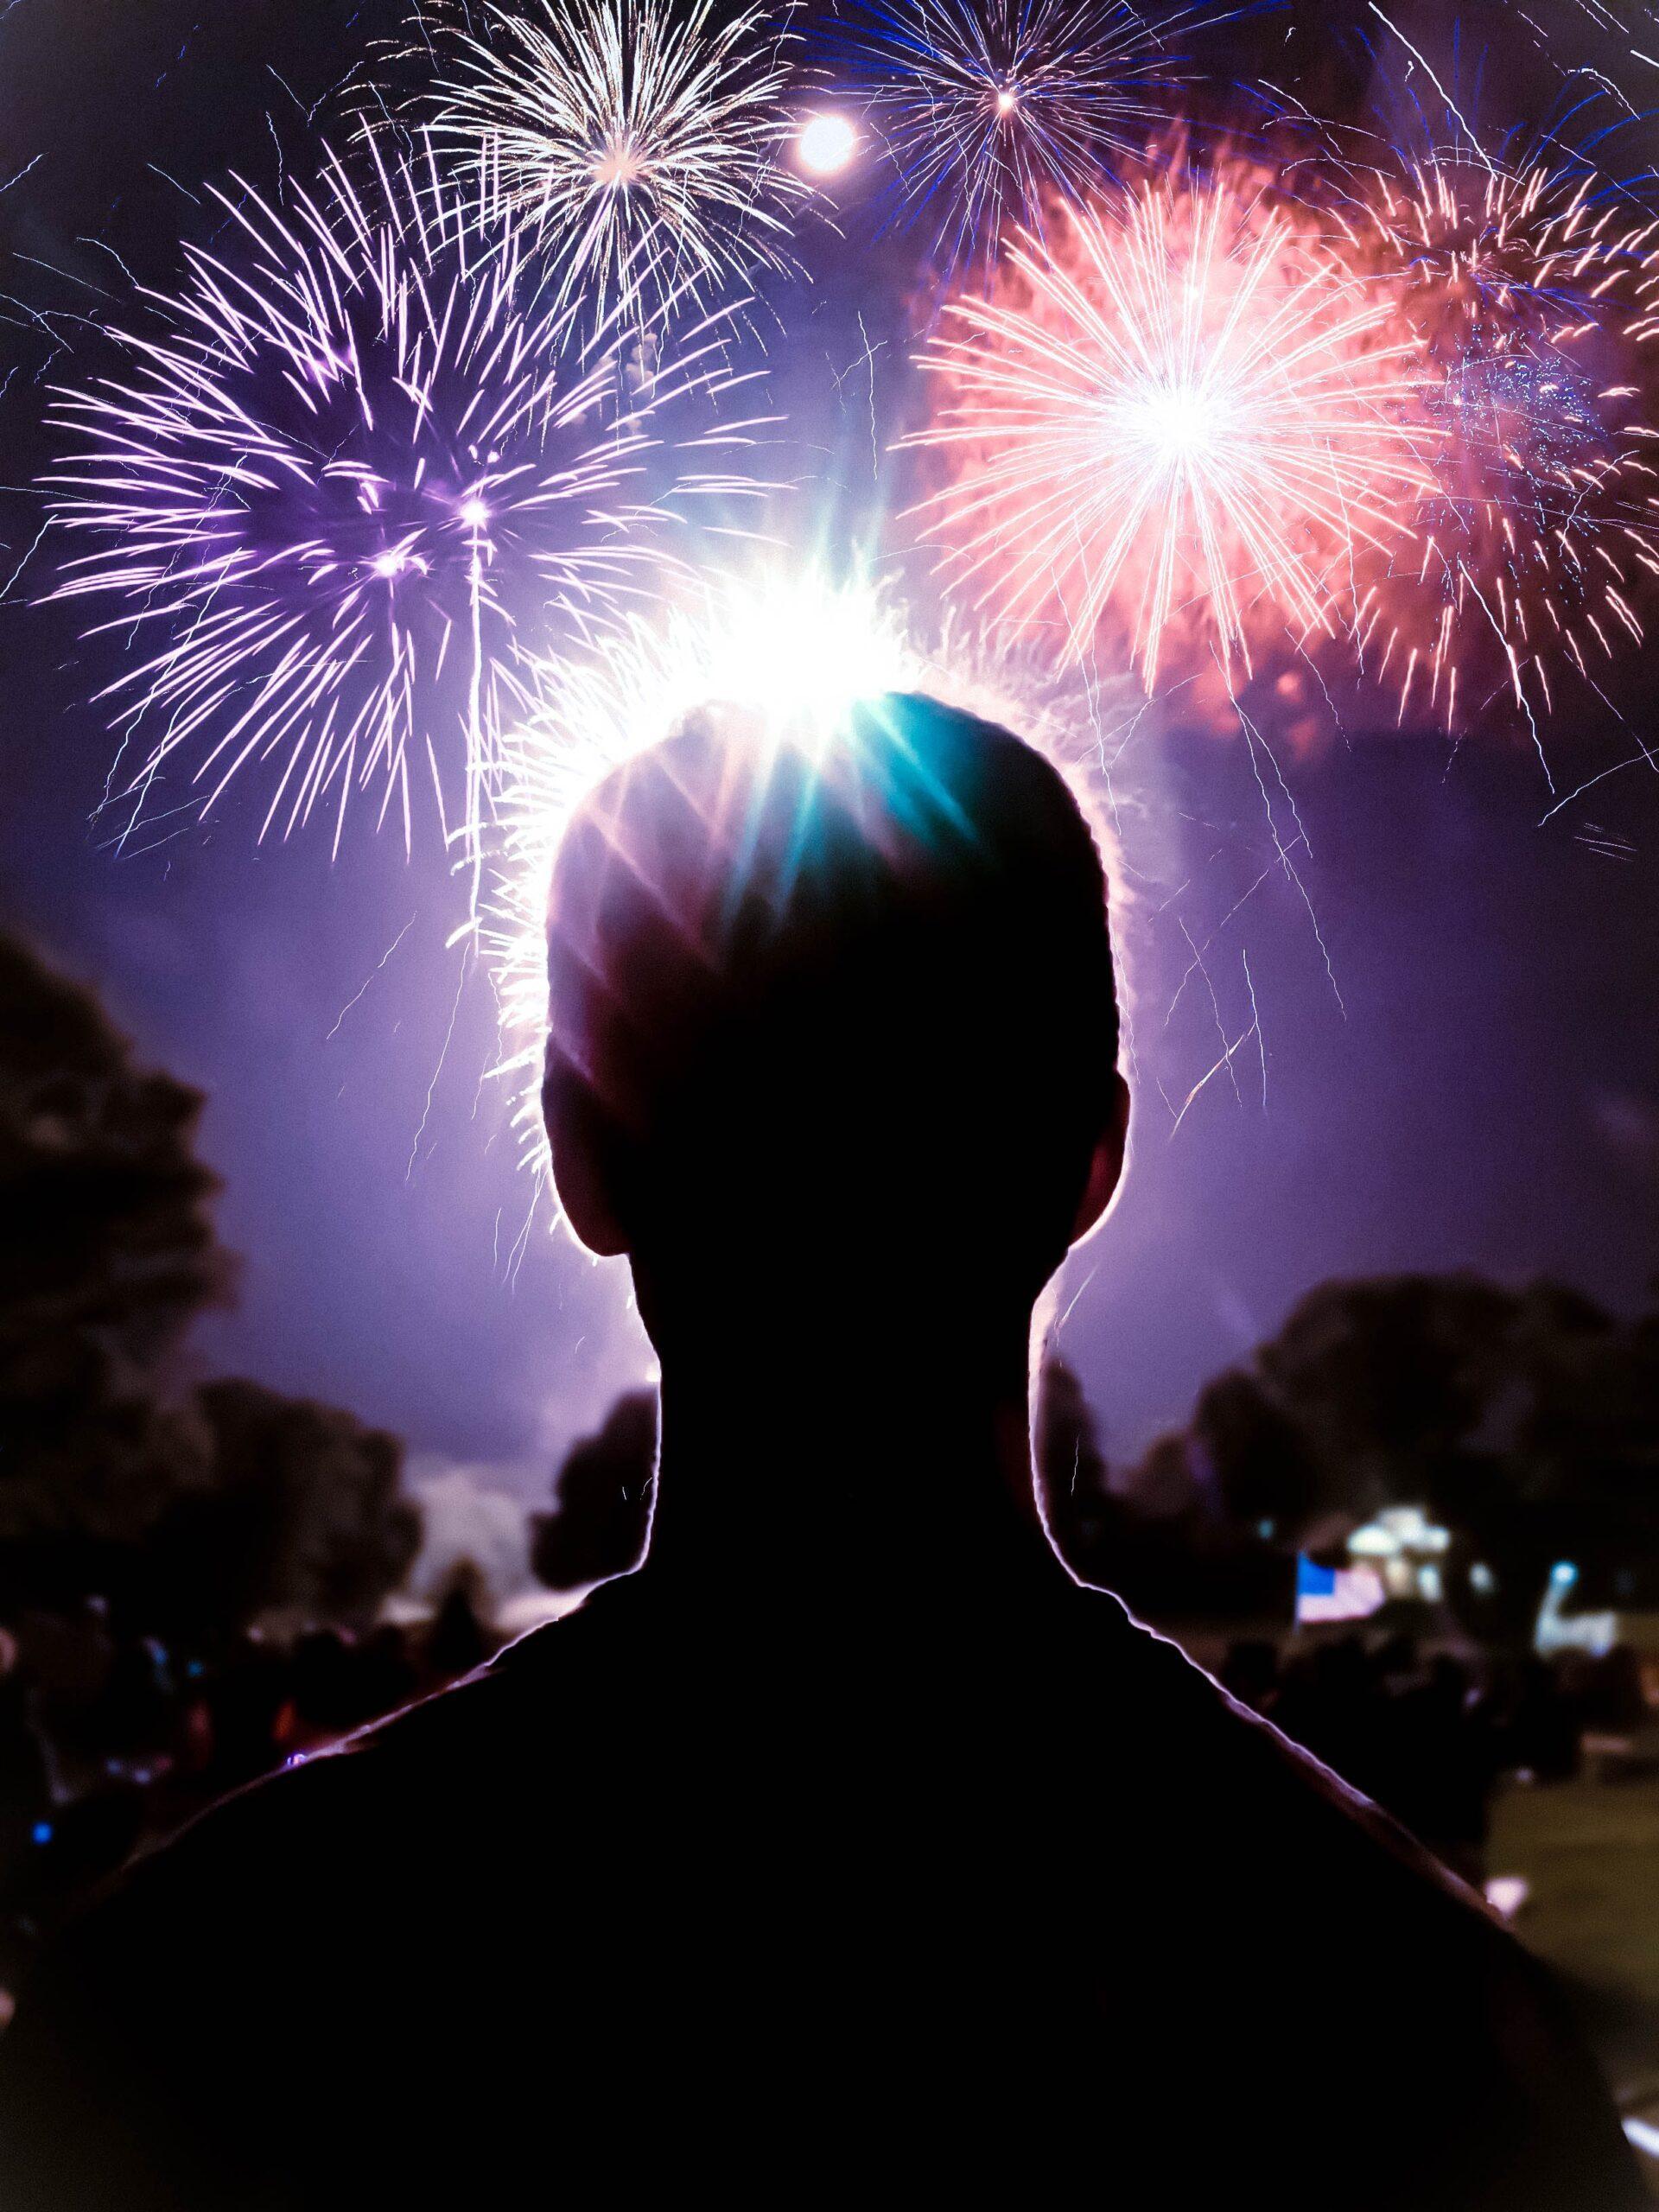 spenser-sembrat-man in foreground looking at fireworks display-unsplash